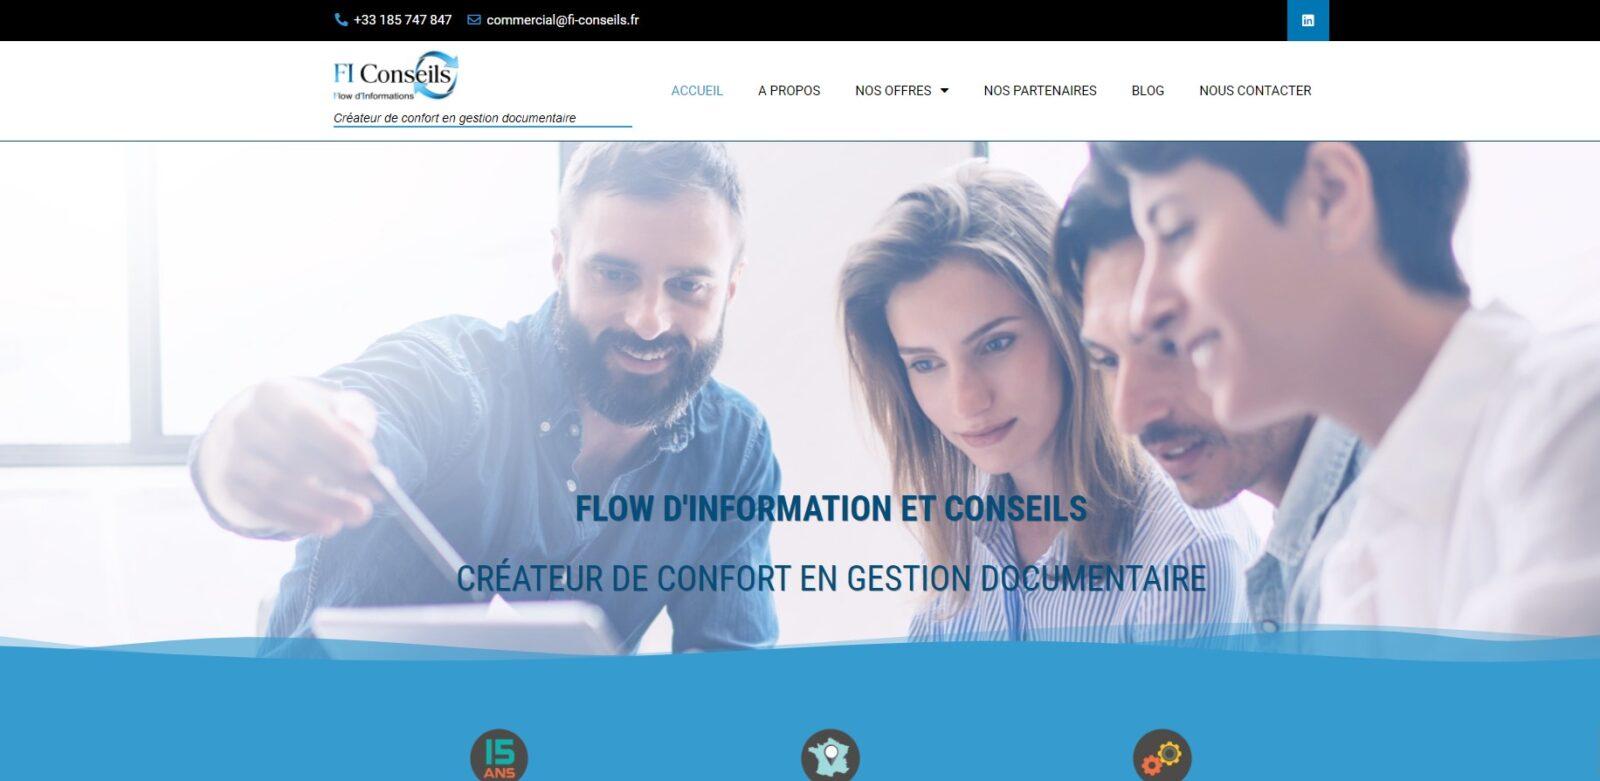 Site vitrine - FI Conseils